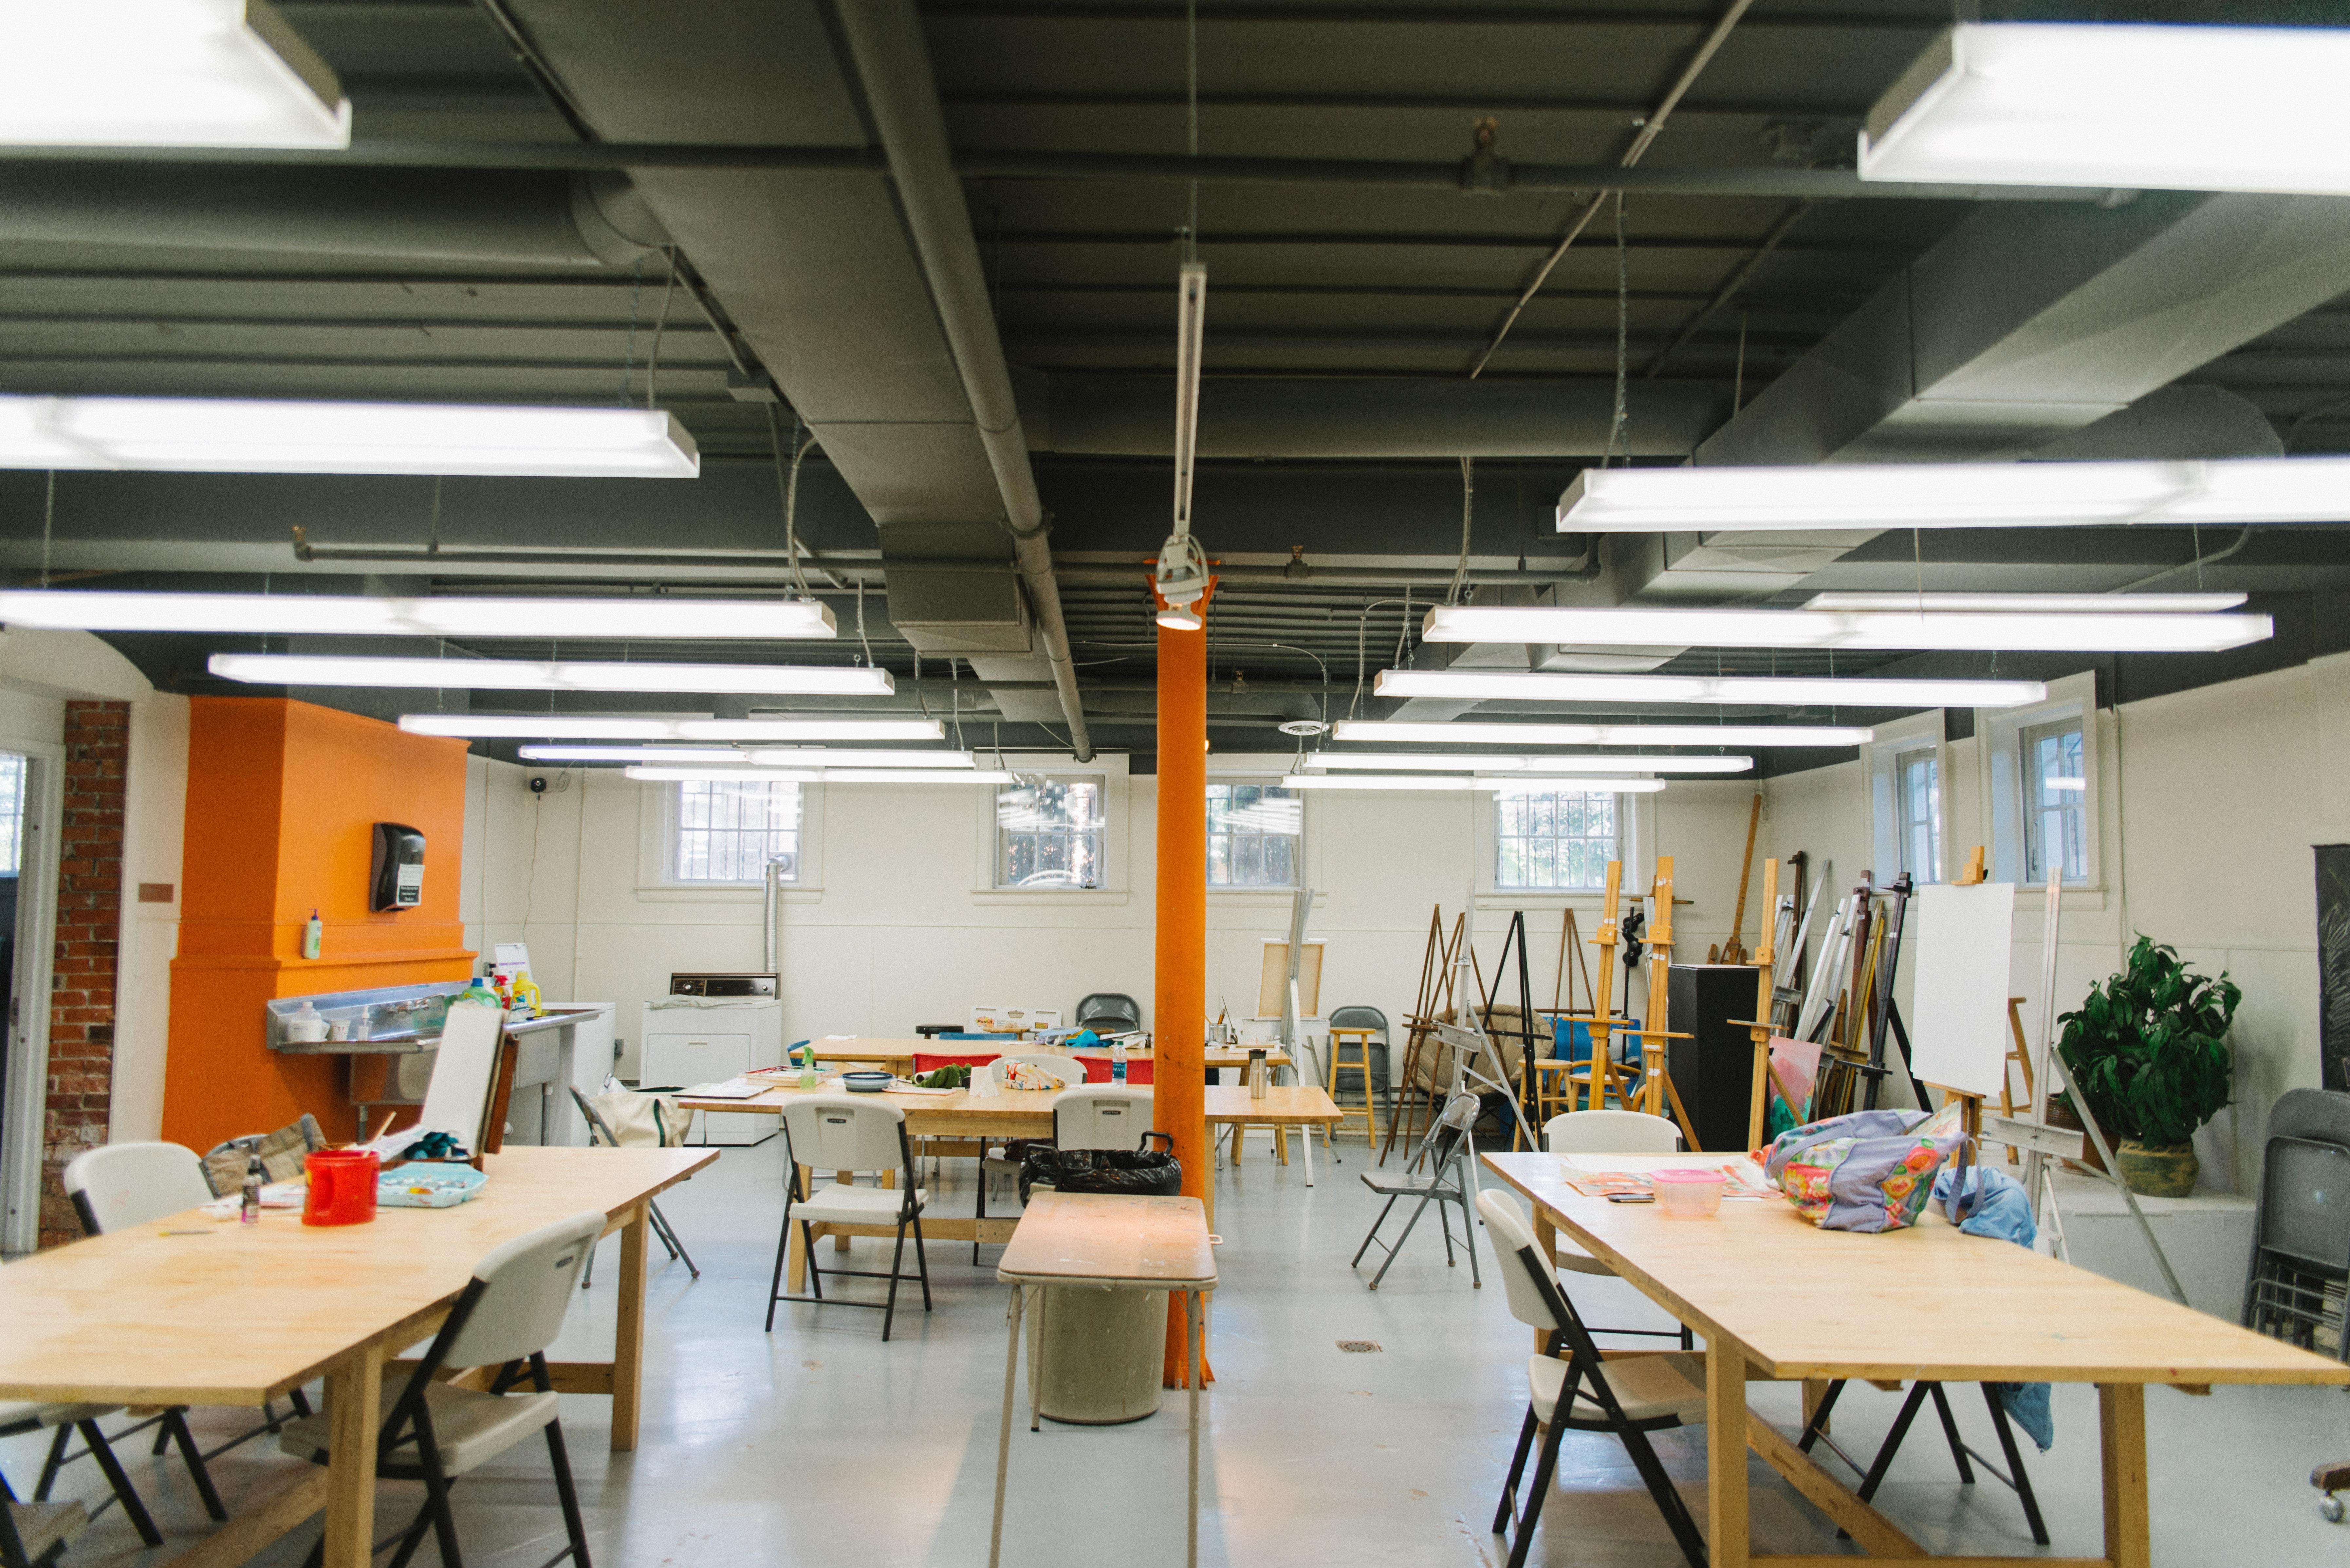 classroom 2 studio 2